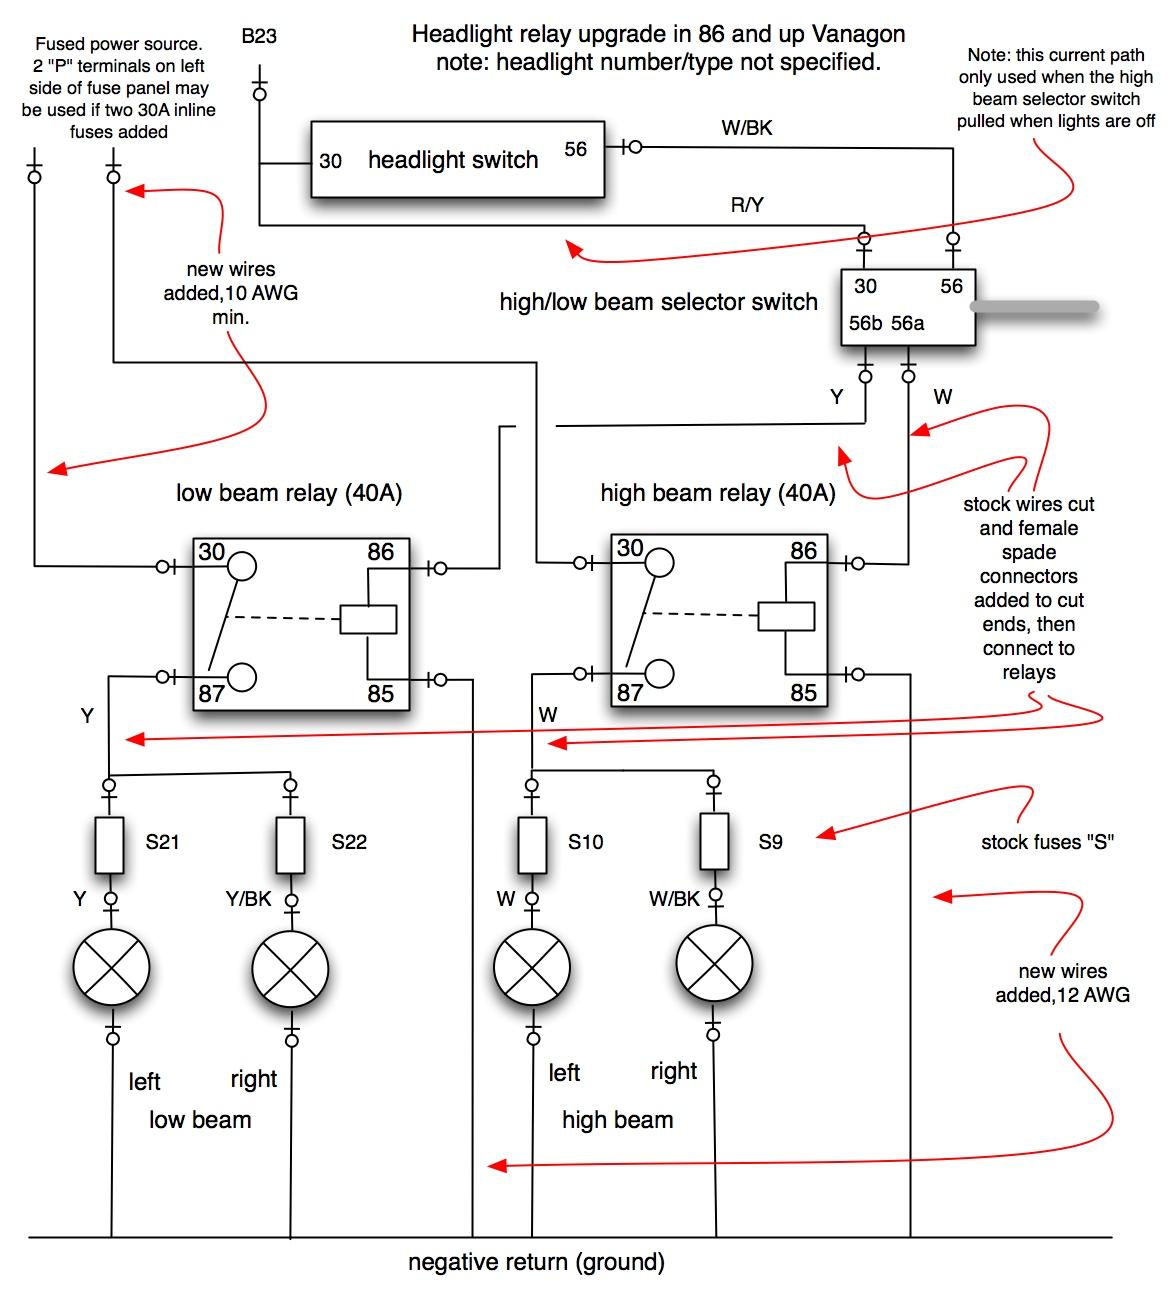 wolfsburg vw engine tin diagram wiring library vw engine parts vanagon engine sheet metal diagram example [ 1176 x 1294 Pixel ]